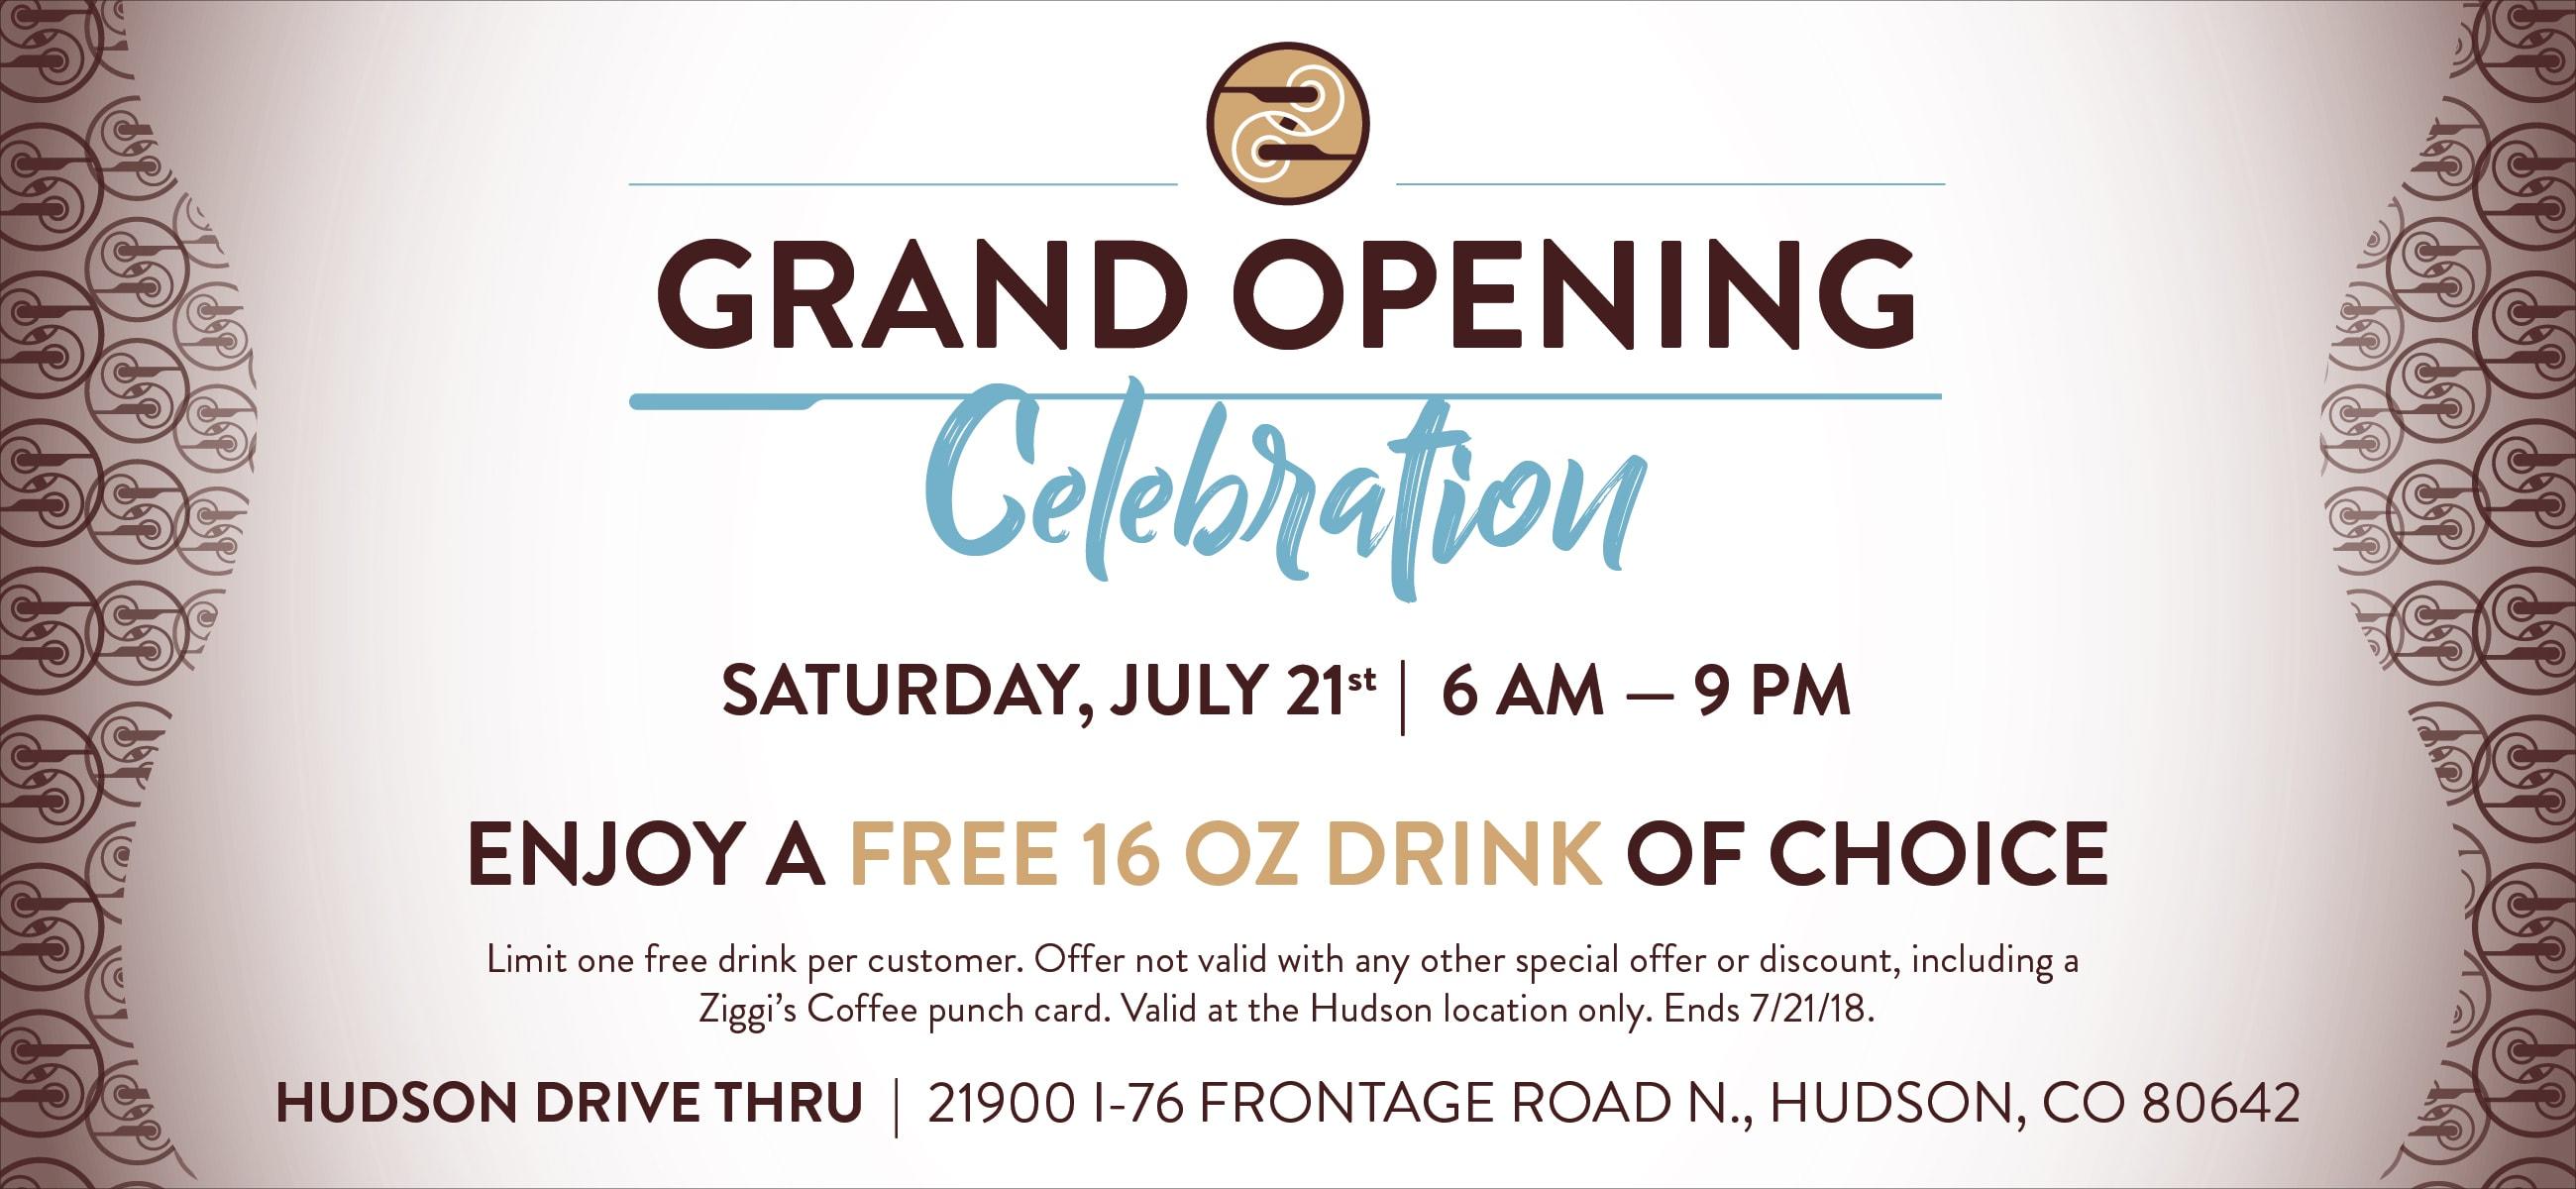 Ziggi's Coffee Hudson Drive Thru Grand Opening Celebration | Saturday, July 21st, 6am-9pm | 21900 I-76 Frontage Rd. N., Hudson, CO 80642